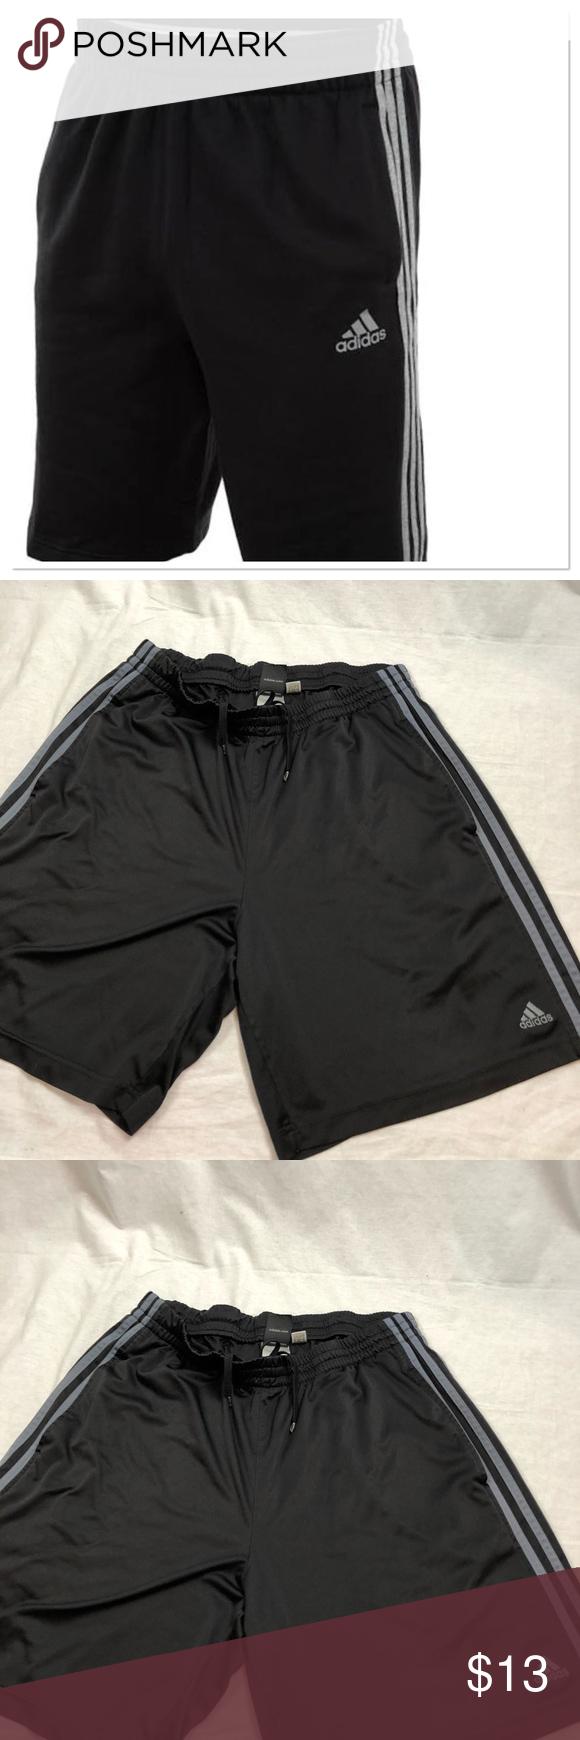 "dcab7f4b0b48 Adidas Men Black Grey Stripes Climate Shorts Sz L Adidas Men Large Black  Grey Stripes Climate Athletic Shorts Gently Used Length 20"" Adidas Shorts  Athletic"